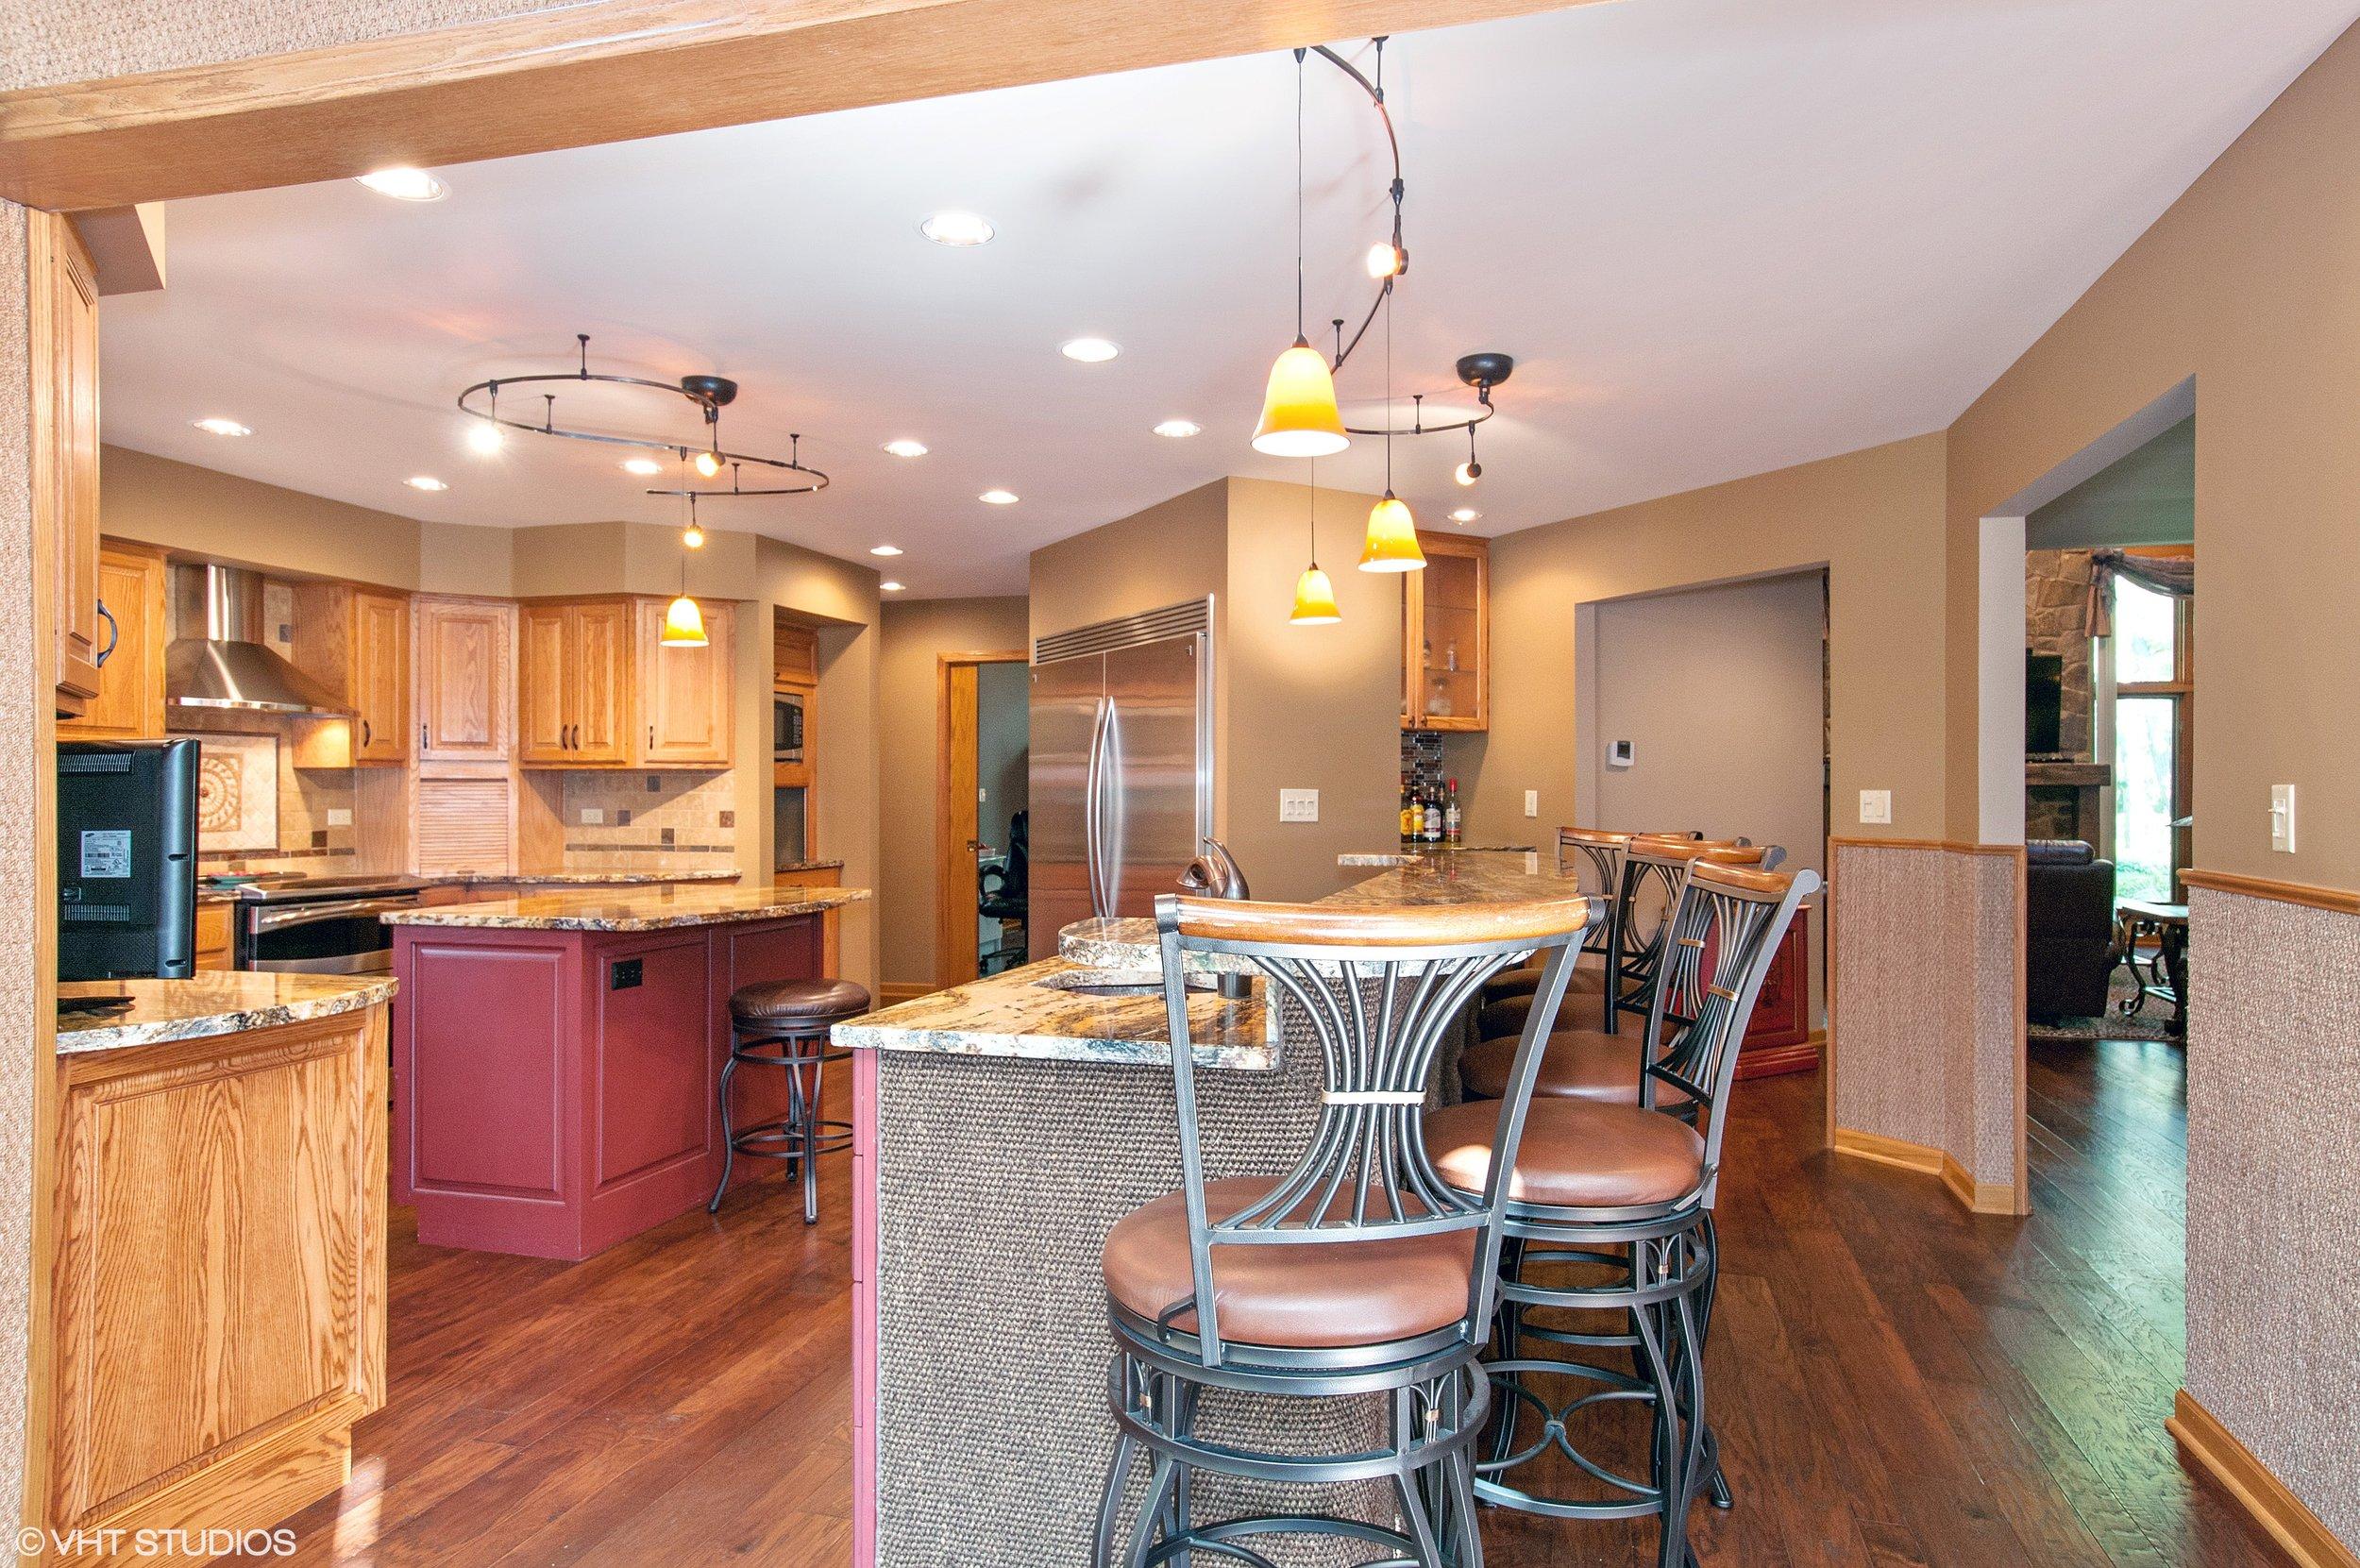 05_5704Riverview_177001_Kitchen_HiRes.jpg